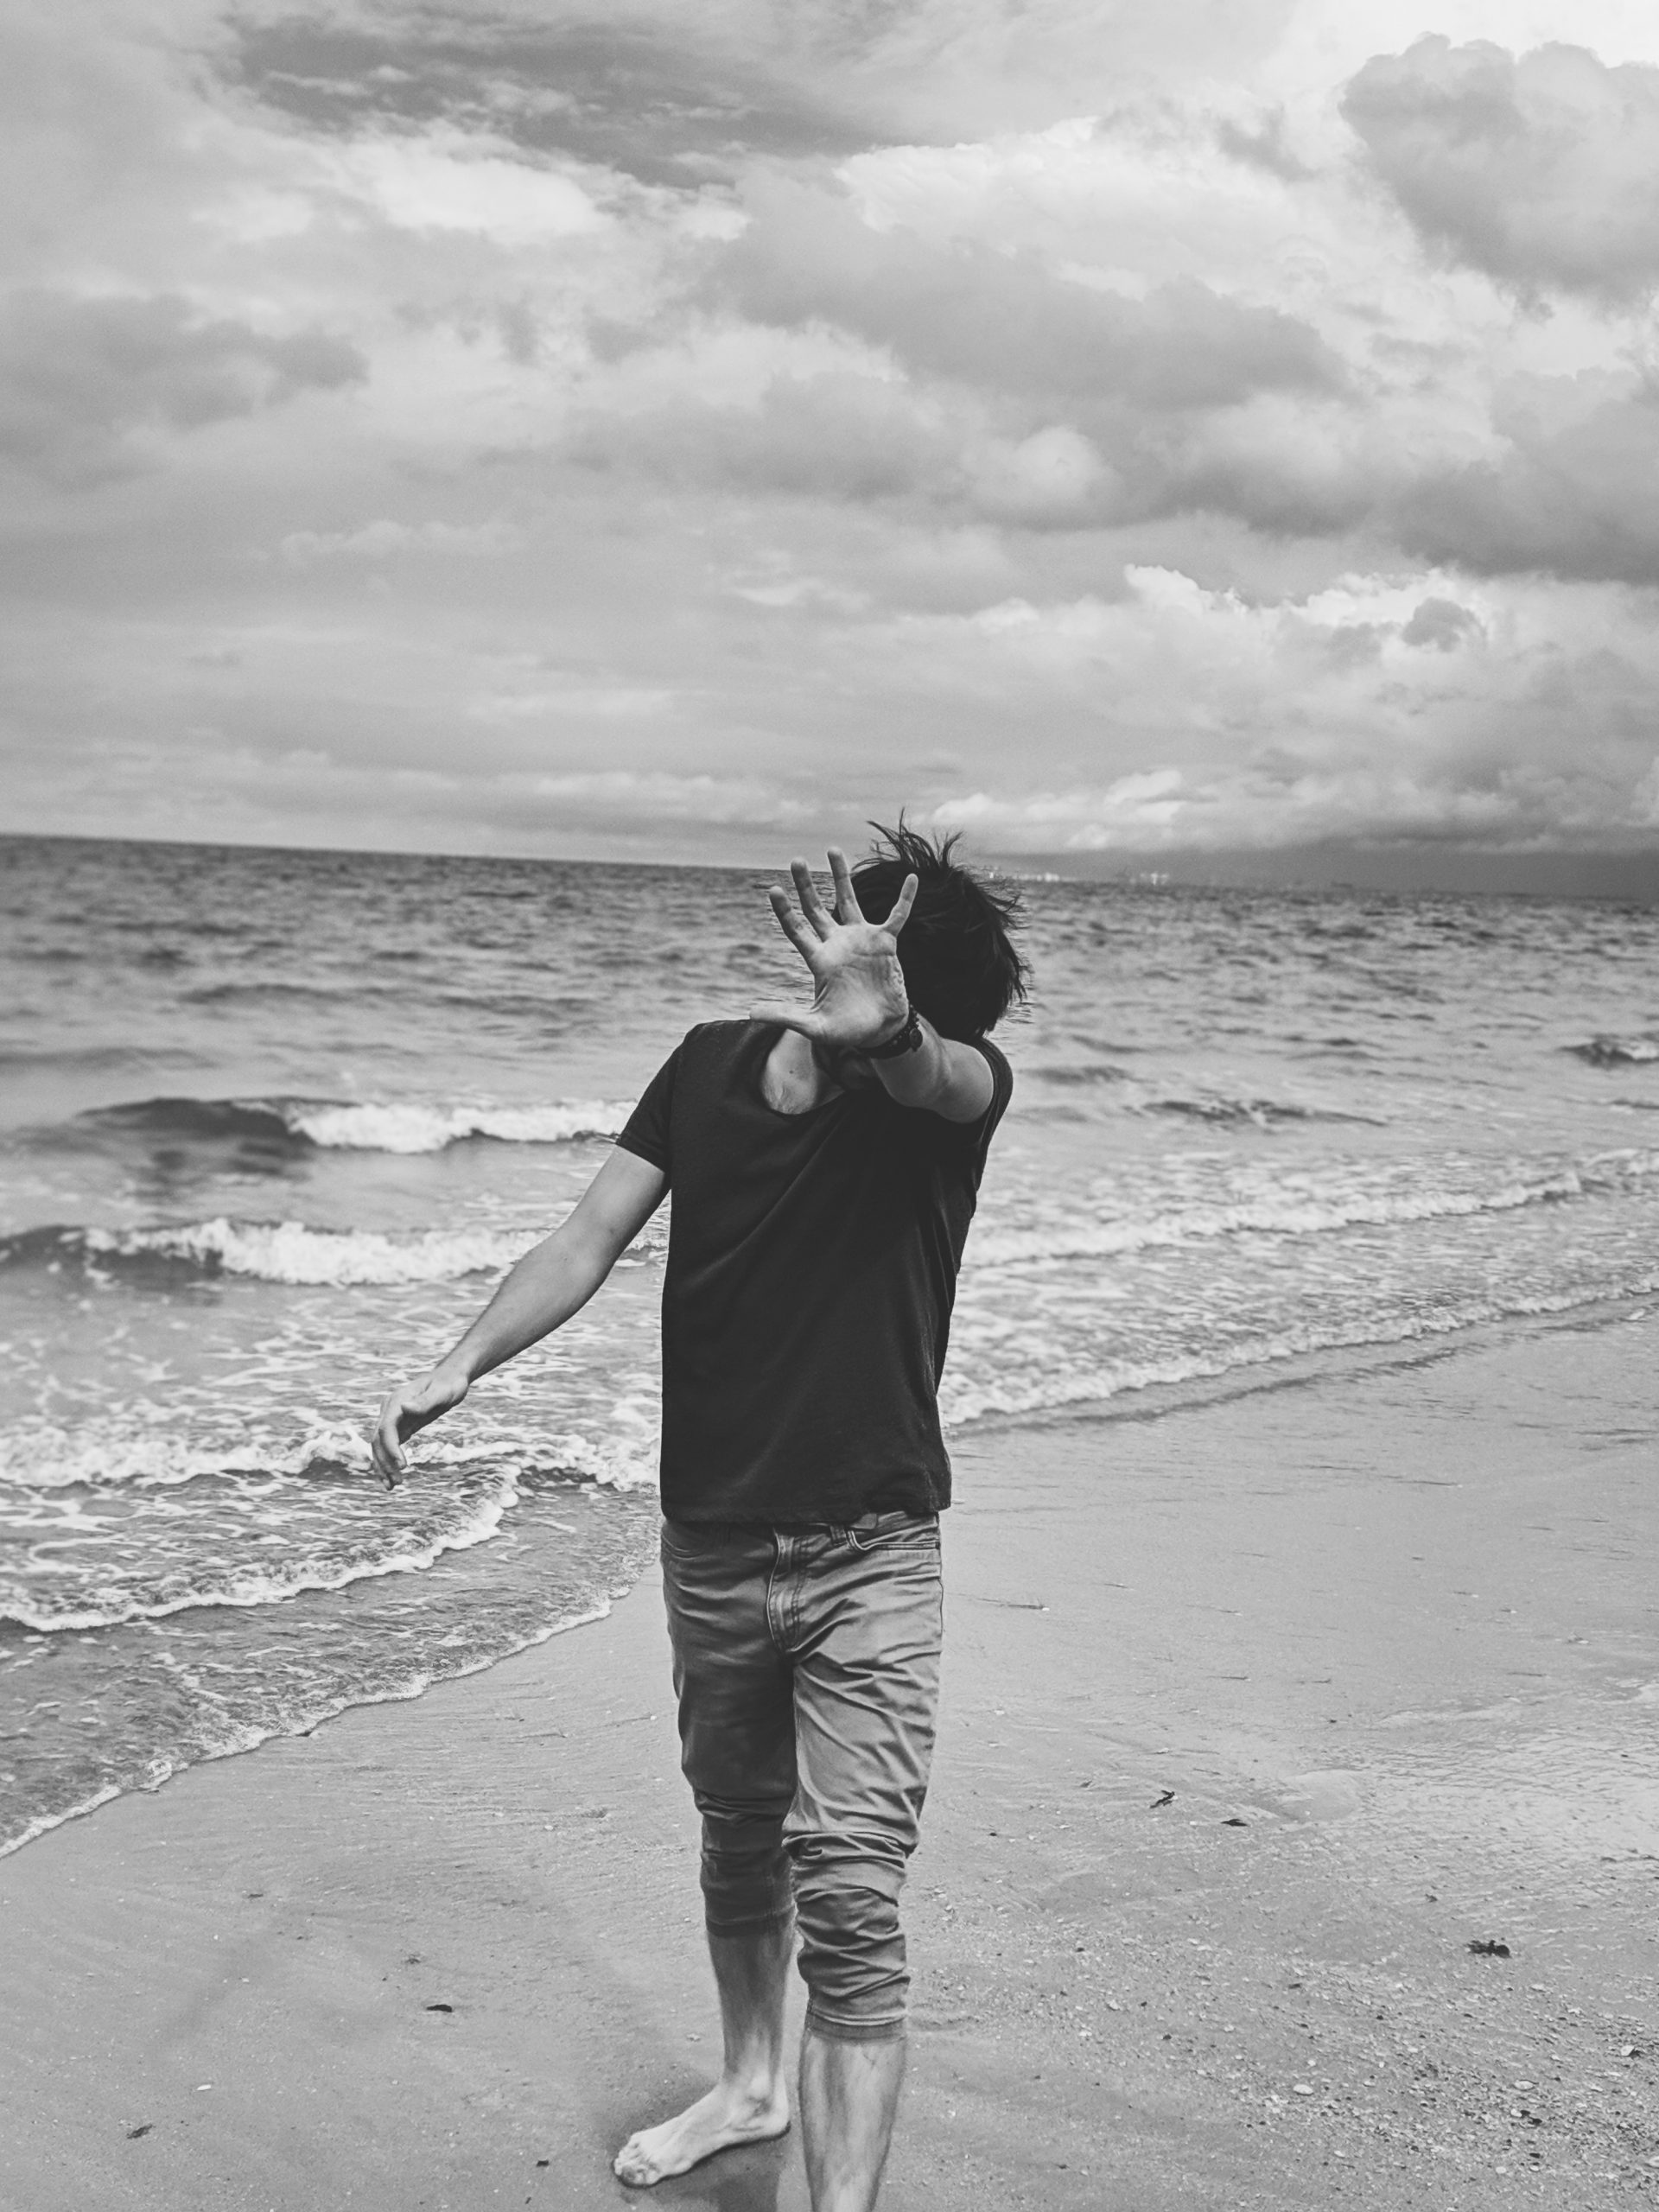 monochrome-photo-of-person-standing-on-seashore-2762839